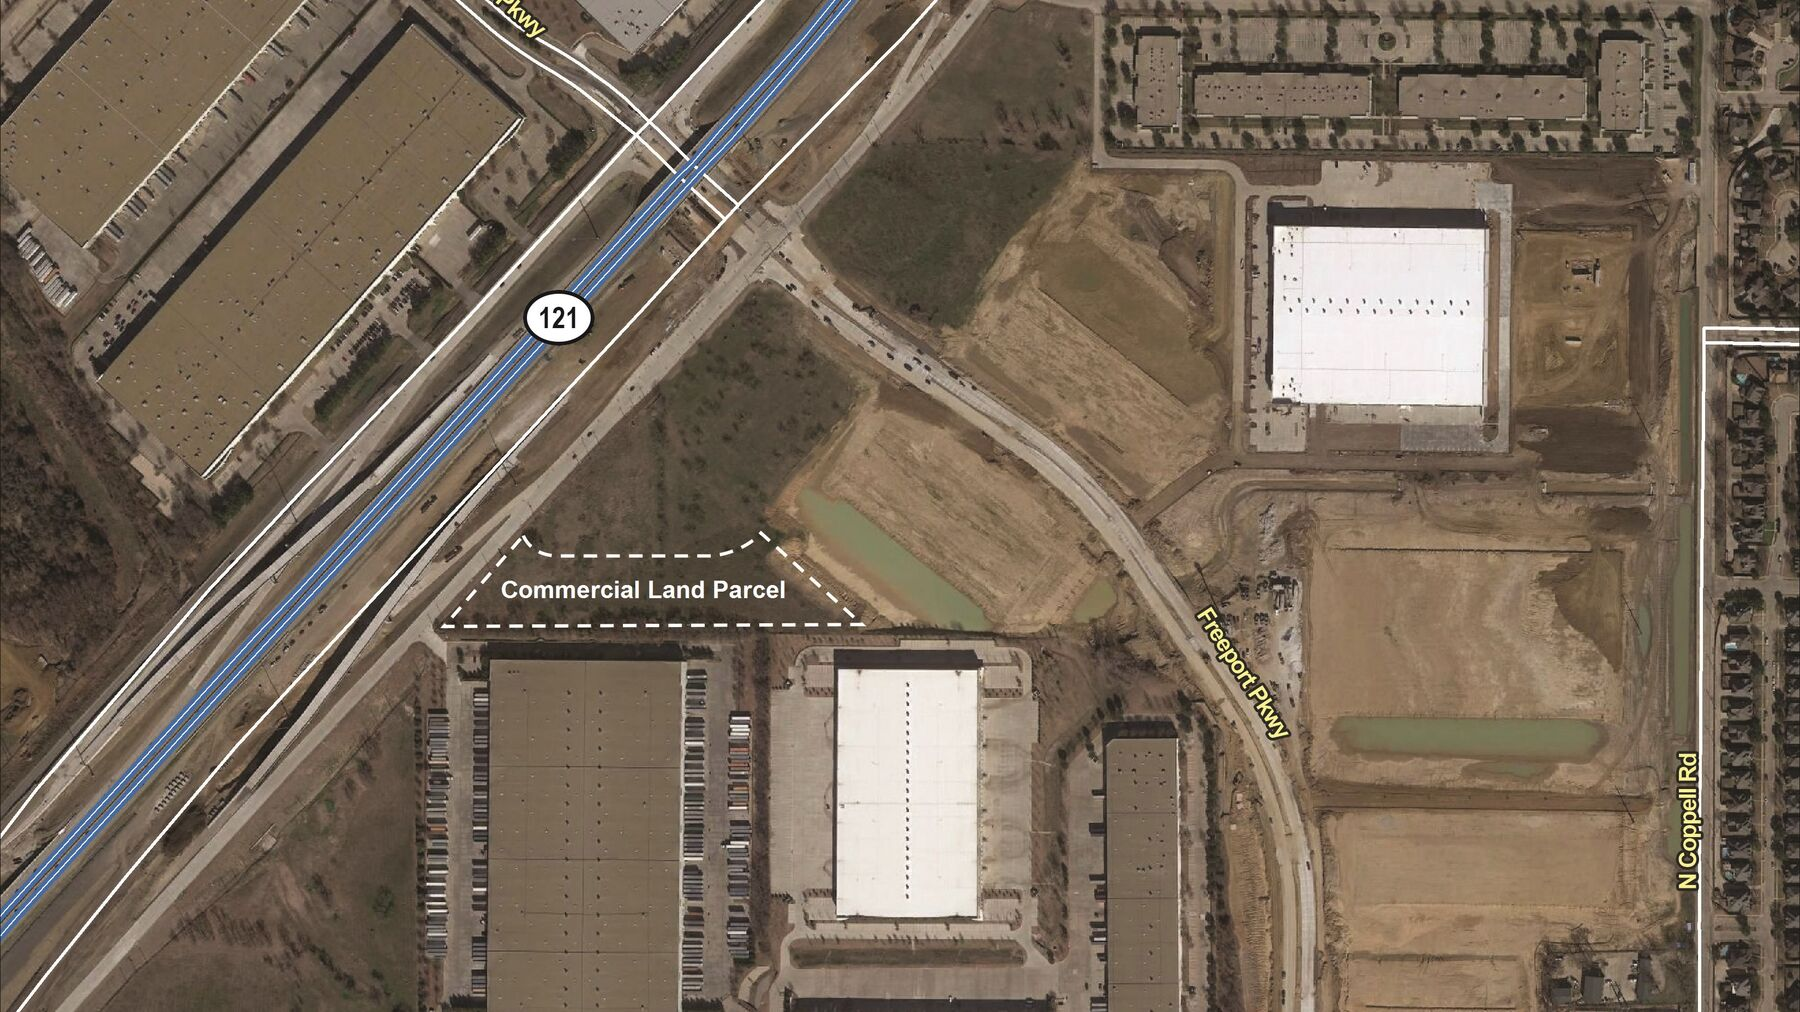 DPM-Prologis-Park-121-Land-DAL05490-N-Freeport-Parkway_AerialMap.jpg